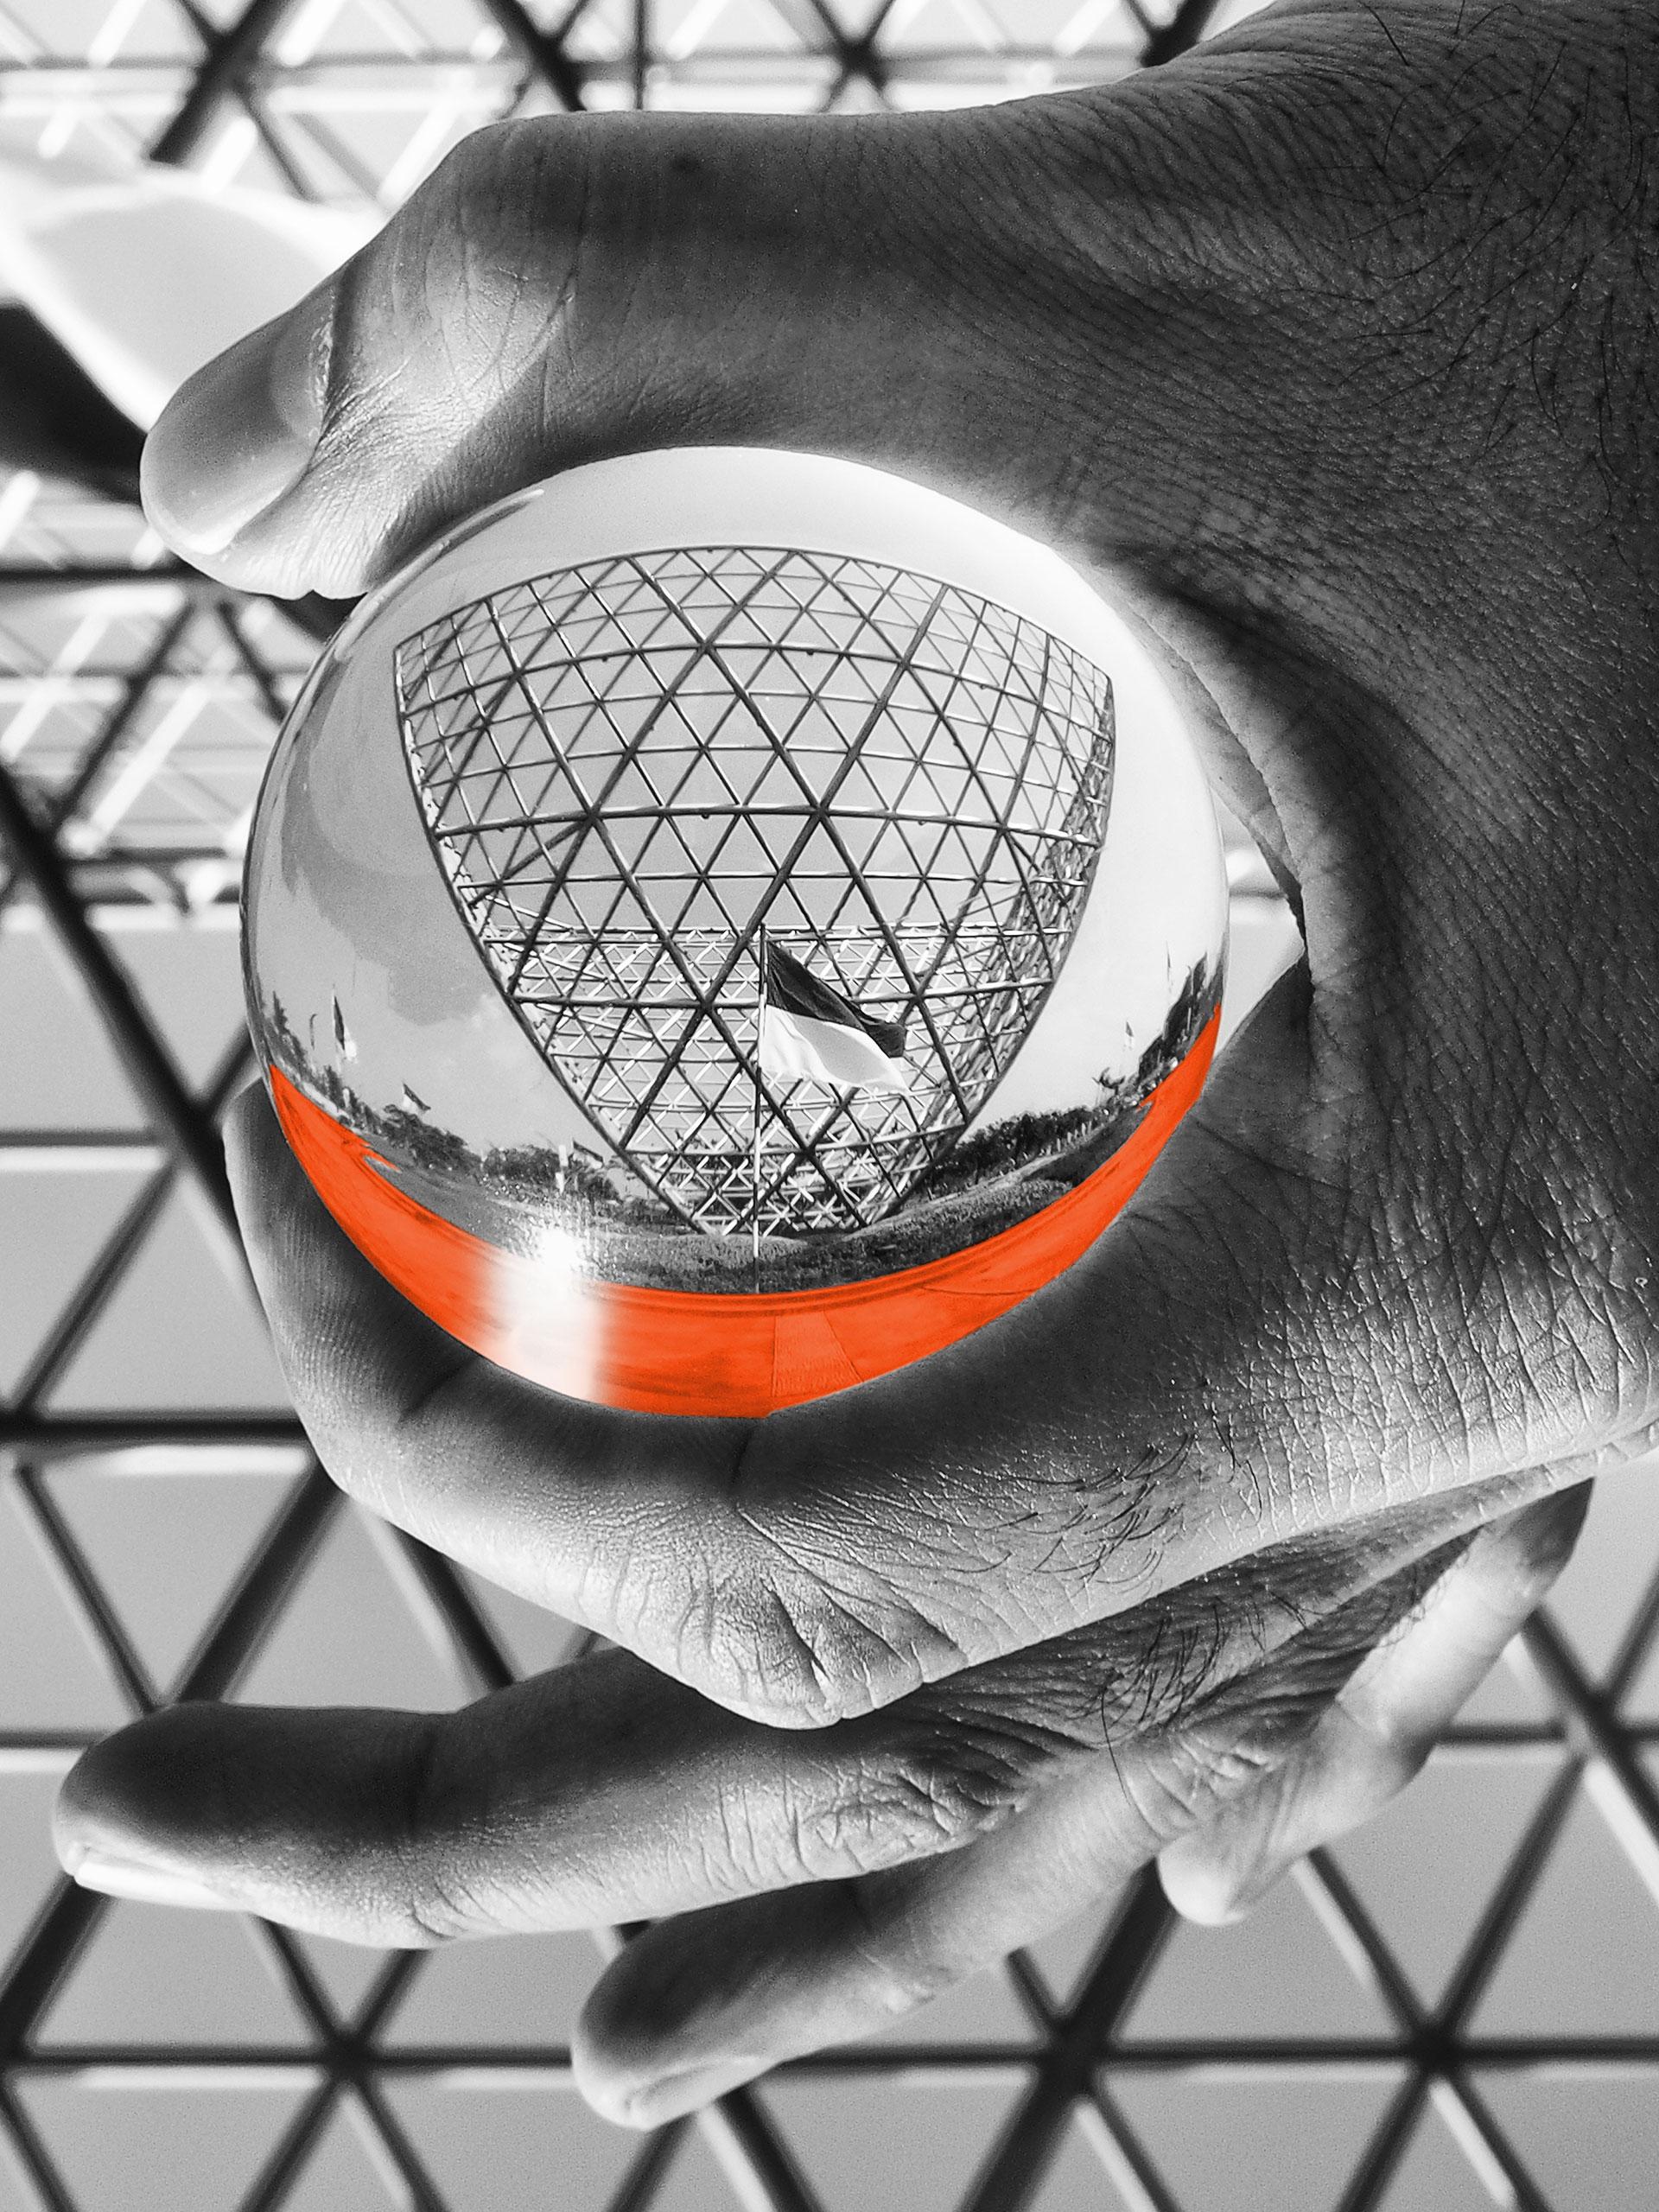 1-winner-_The-Pyramid-(1)